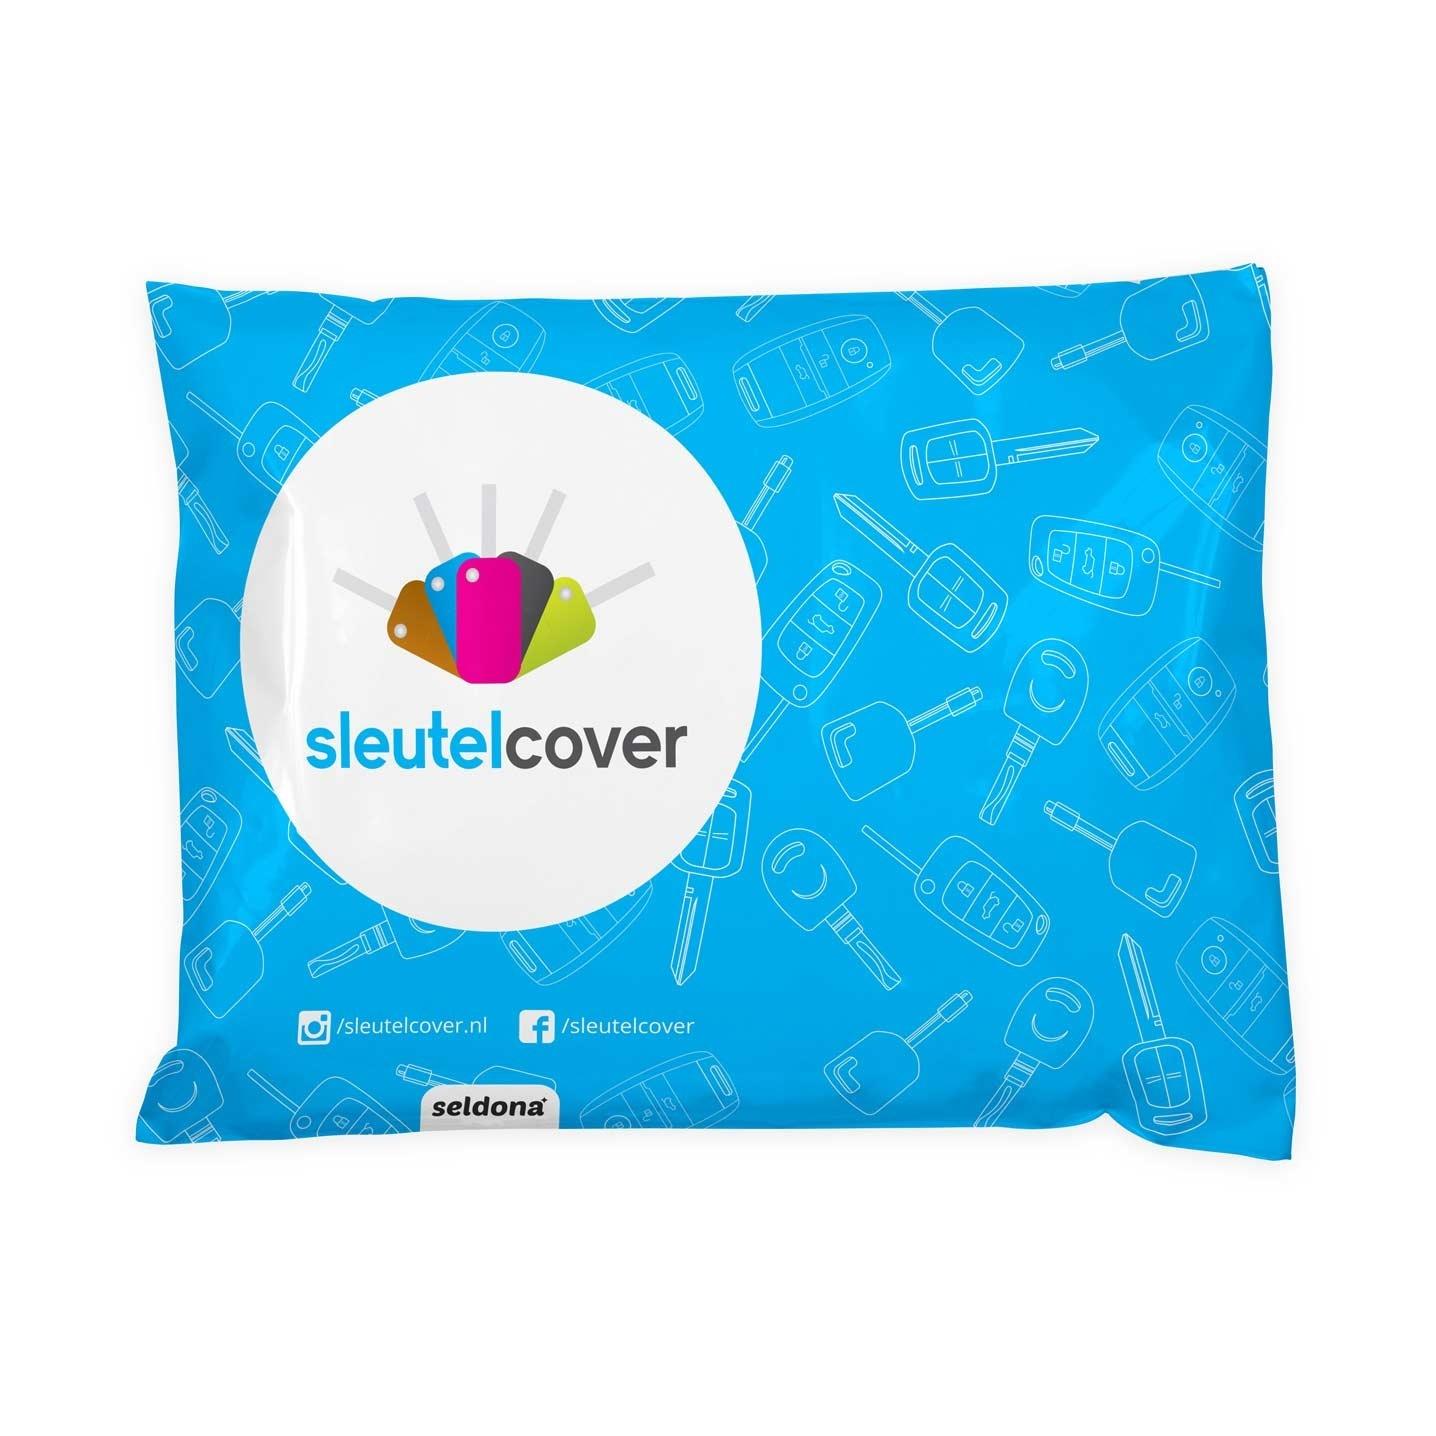 Skoda SleutelCover - Rood / Silicone sleutelhoesje / beschermhoesje autosleutel